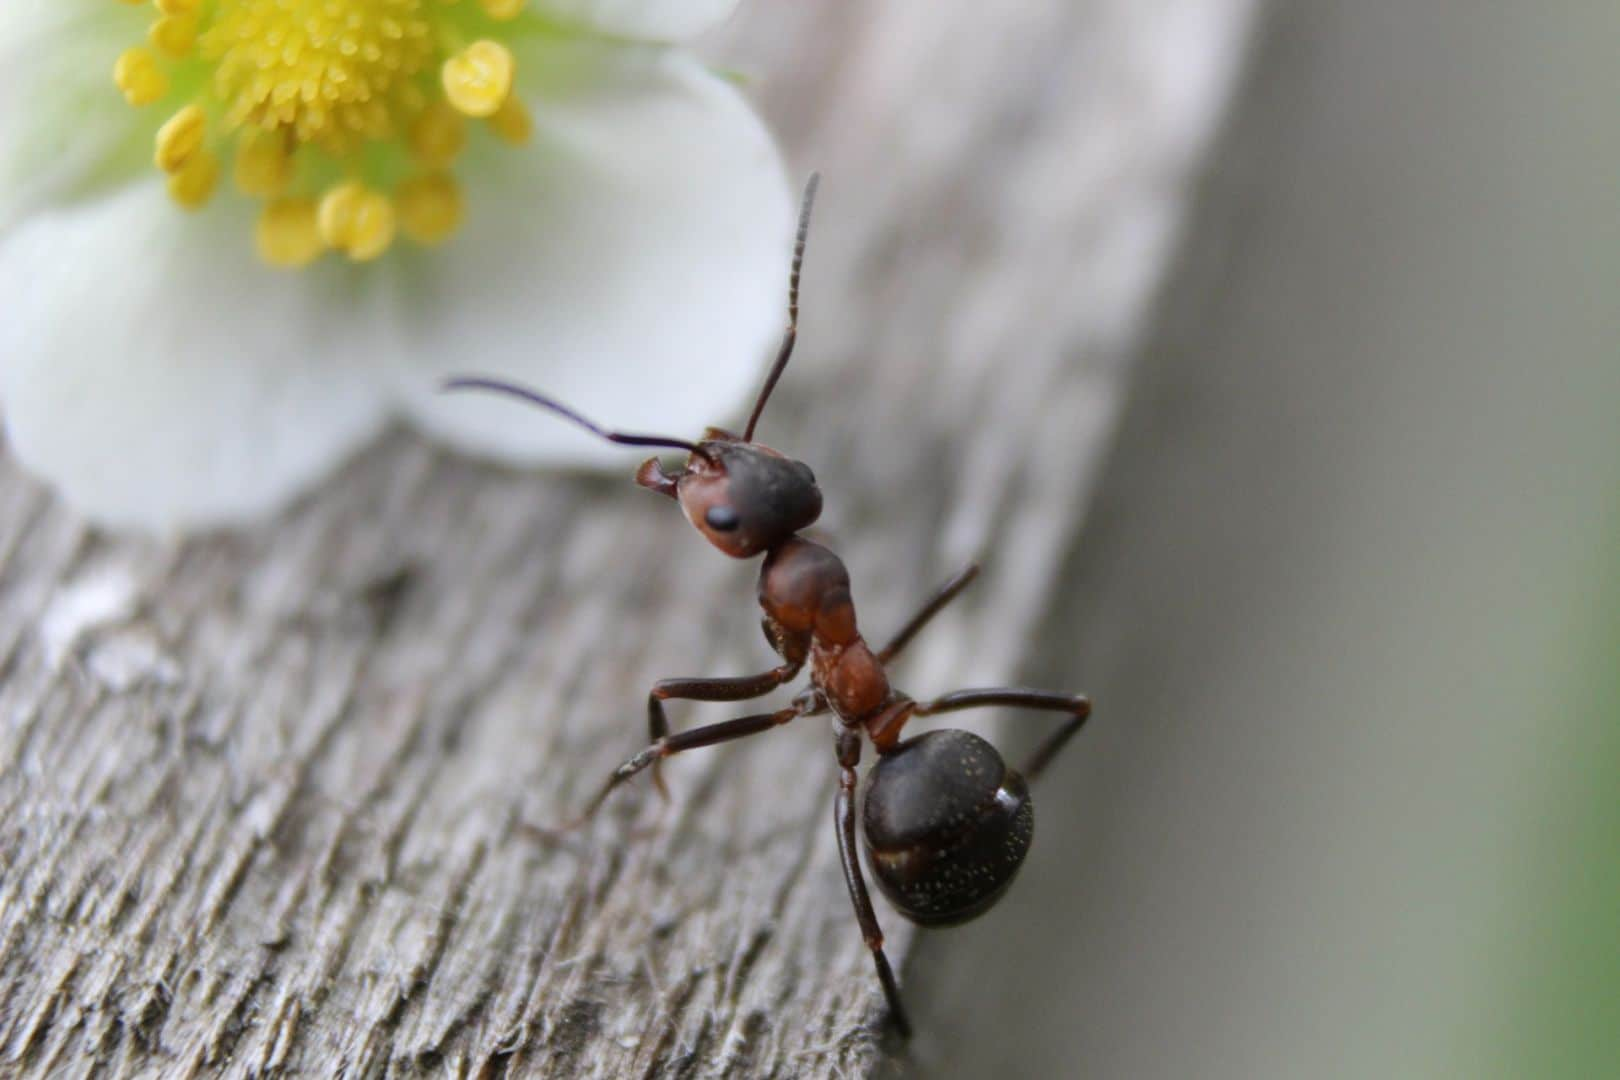 Mravce v dome